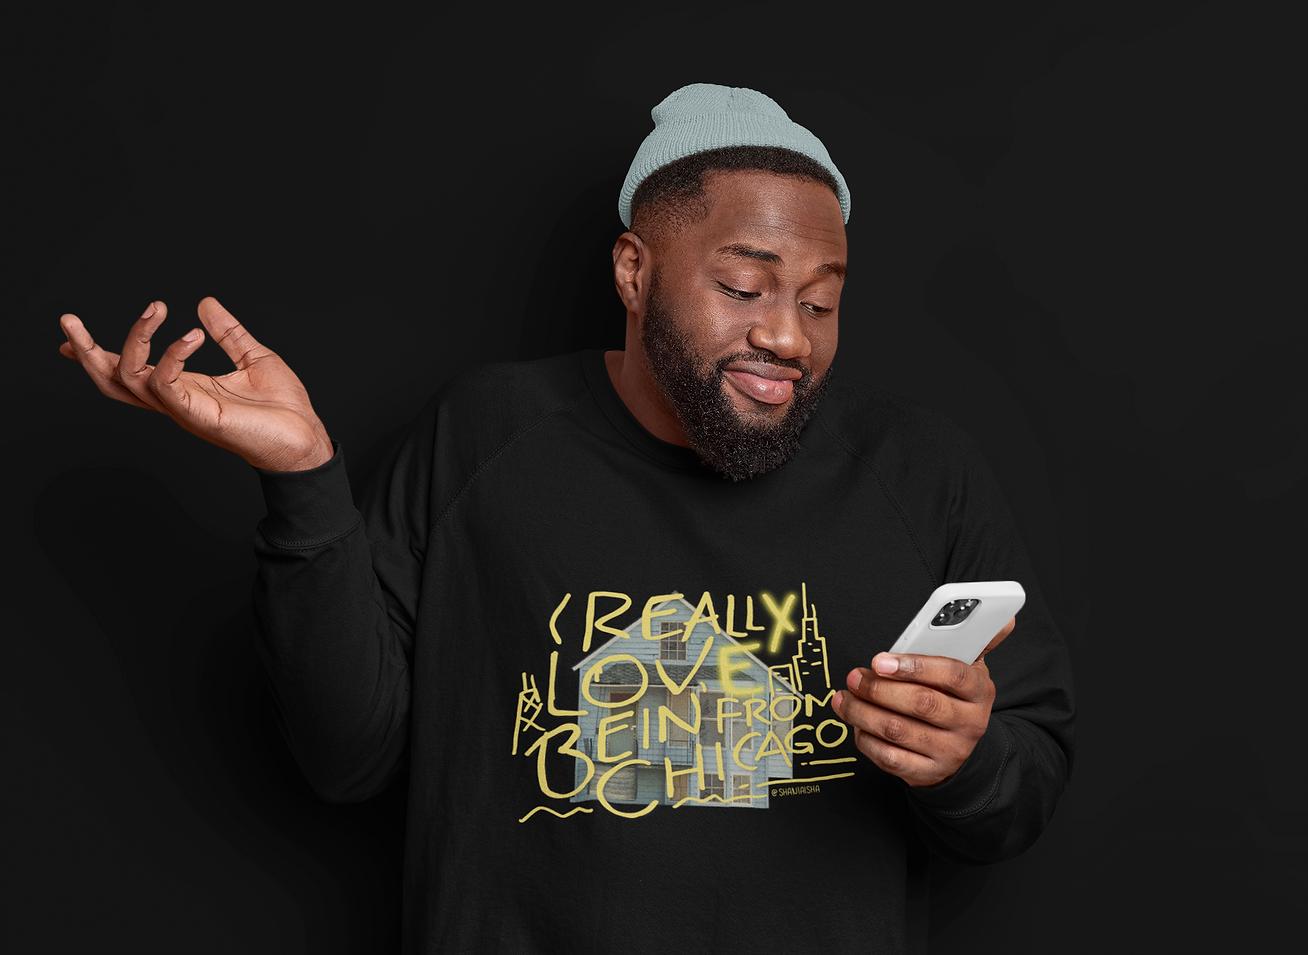 sweatshirt-mockup-of-an-indifferent-man-checking-his-phone-m3566-r-el2.png